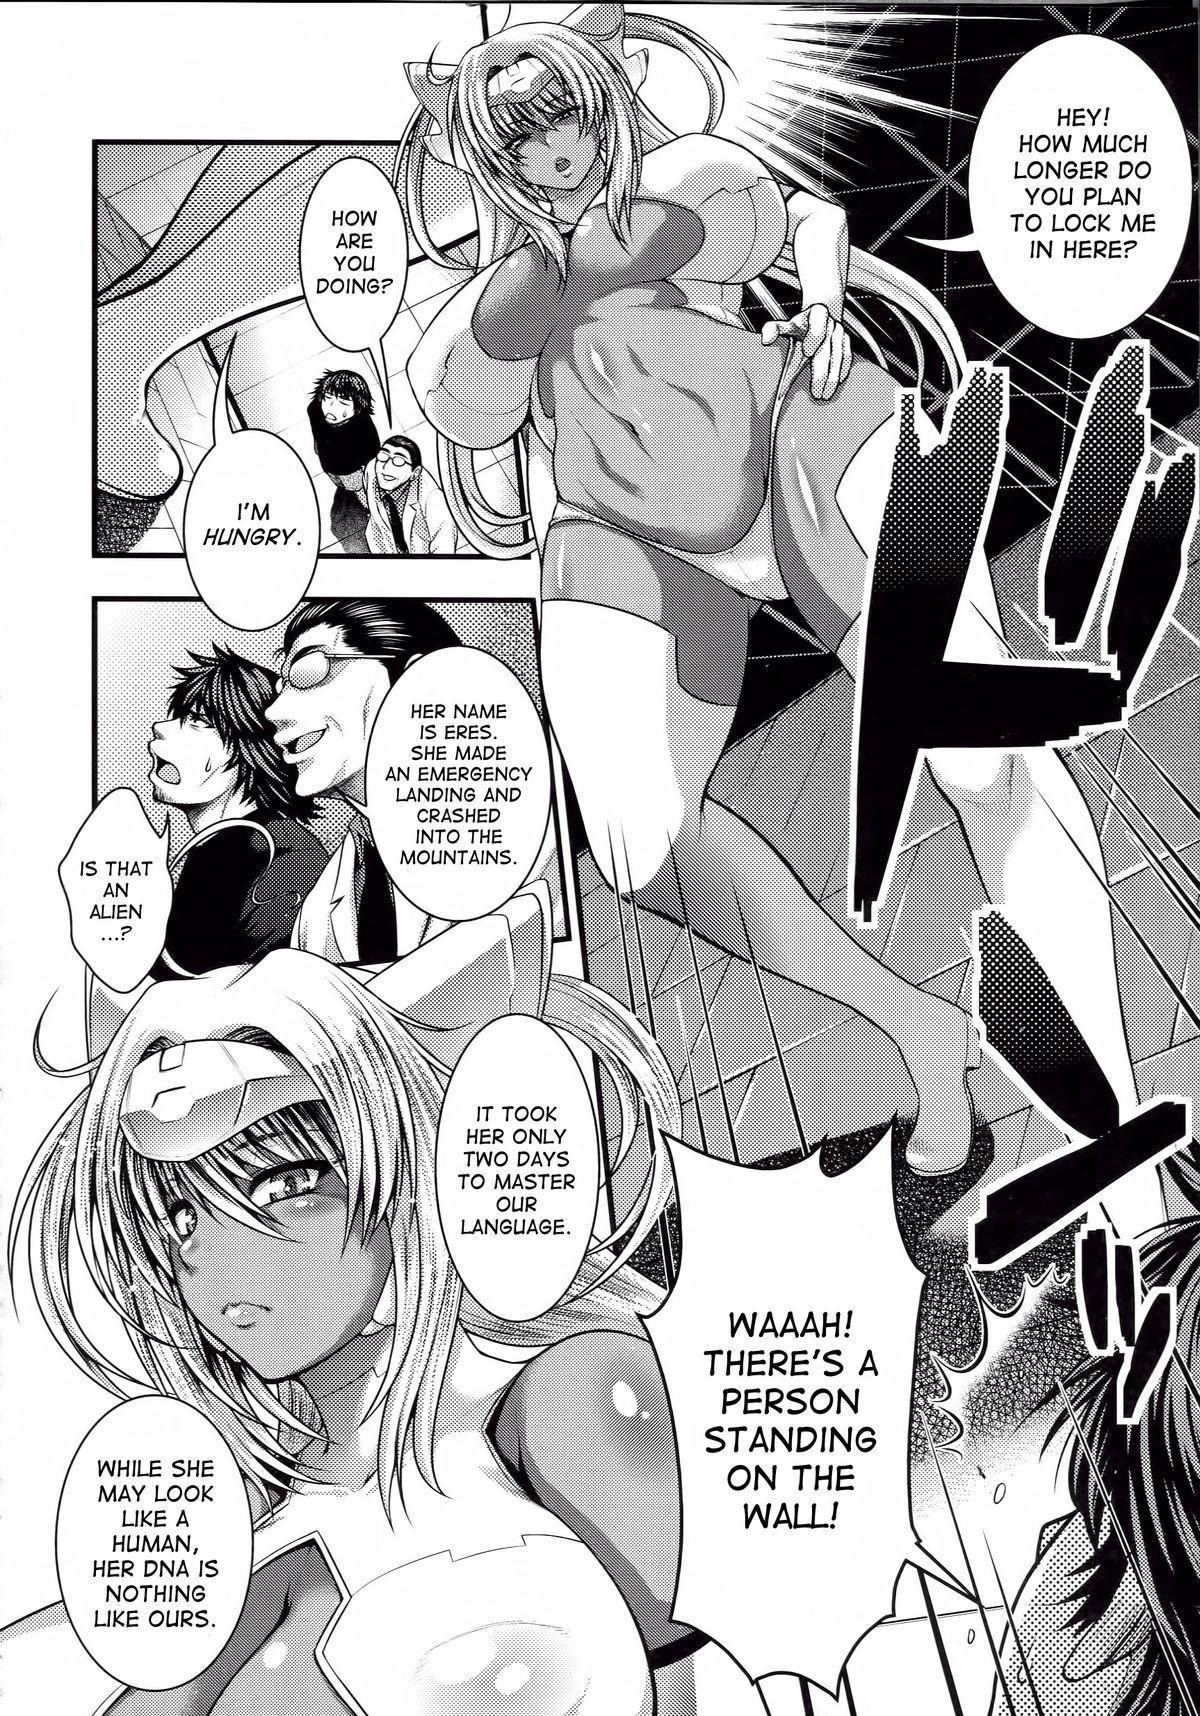 Yuusei yori no Oppai X | The Tits From Planet X 3